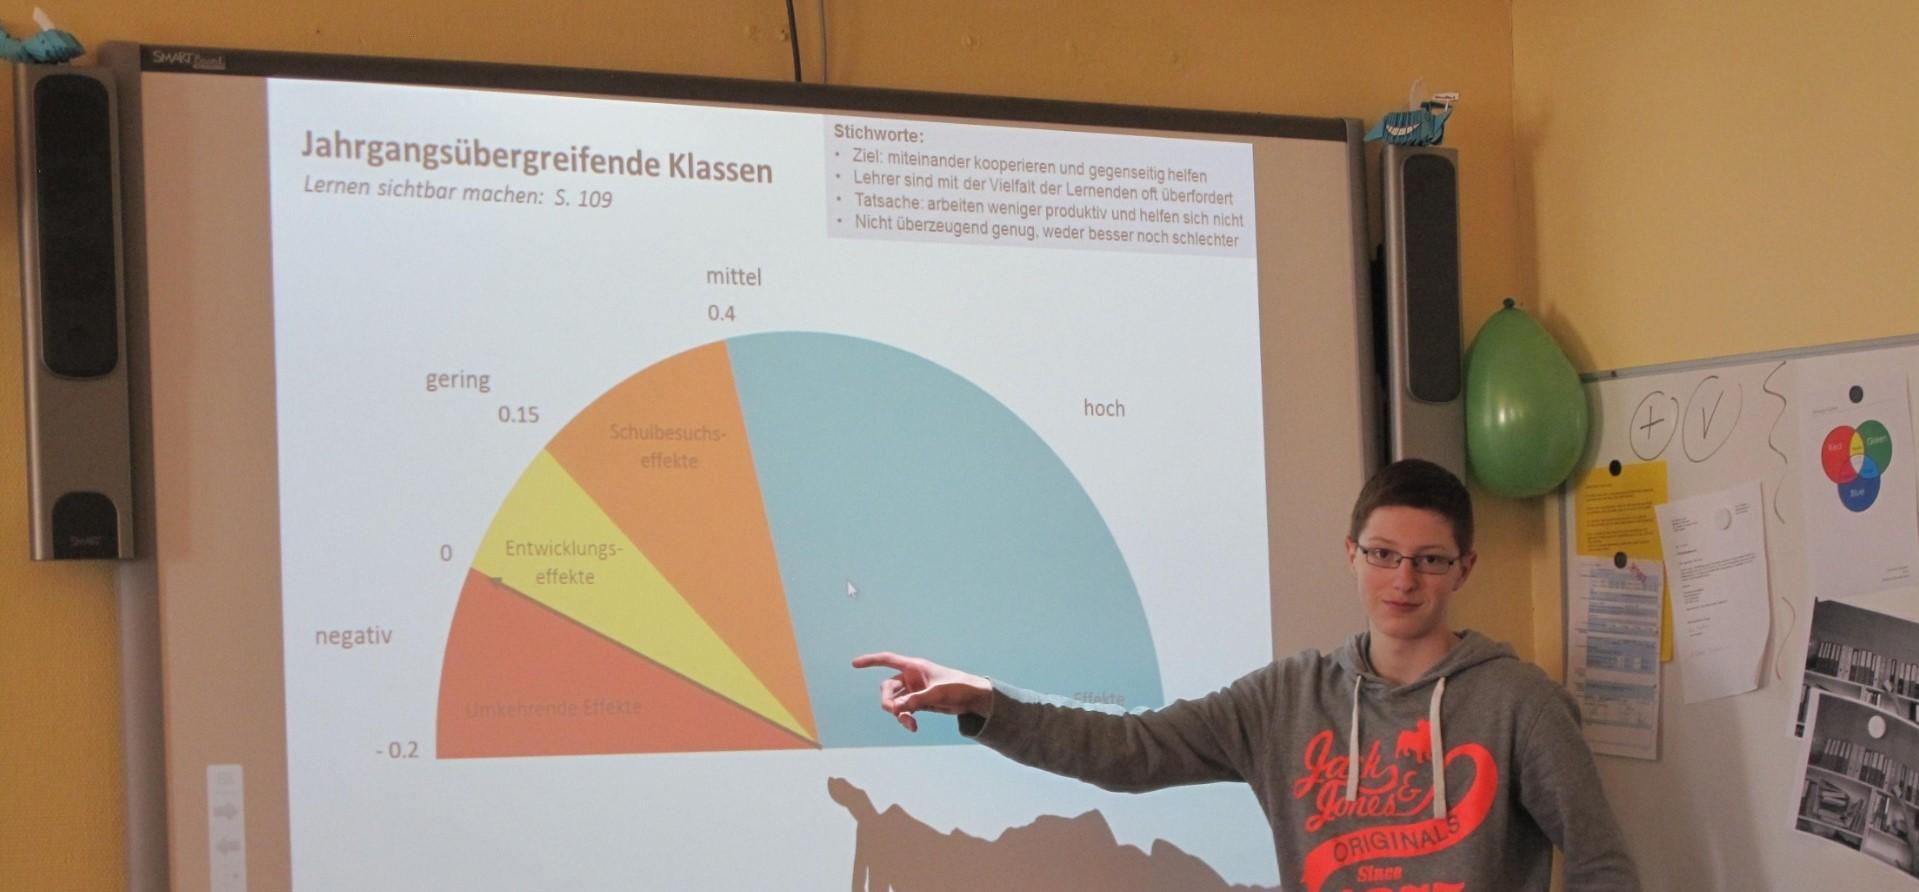 Abb.: Kurzpräsentation zum Faktor Jahrgangsübergreifende Klassen, Sekundarstufe I